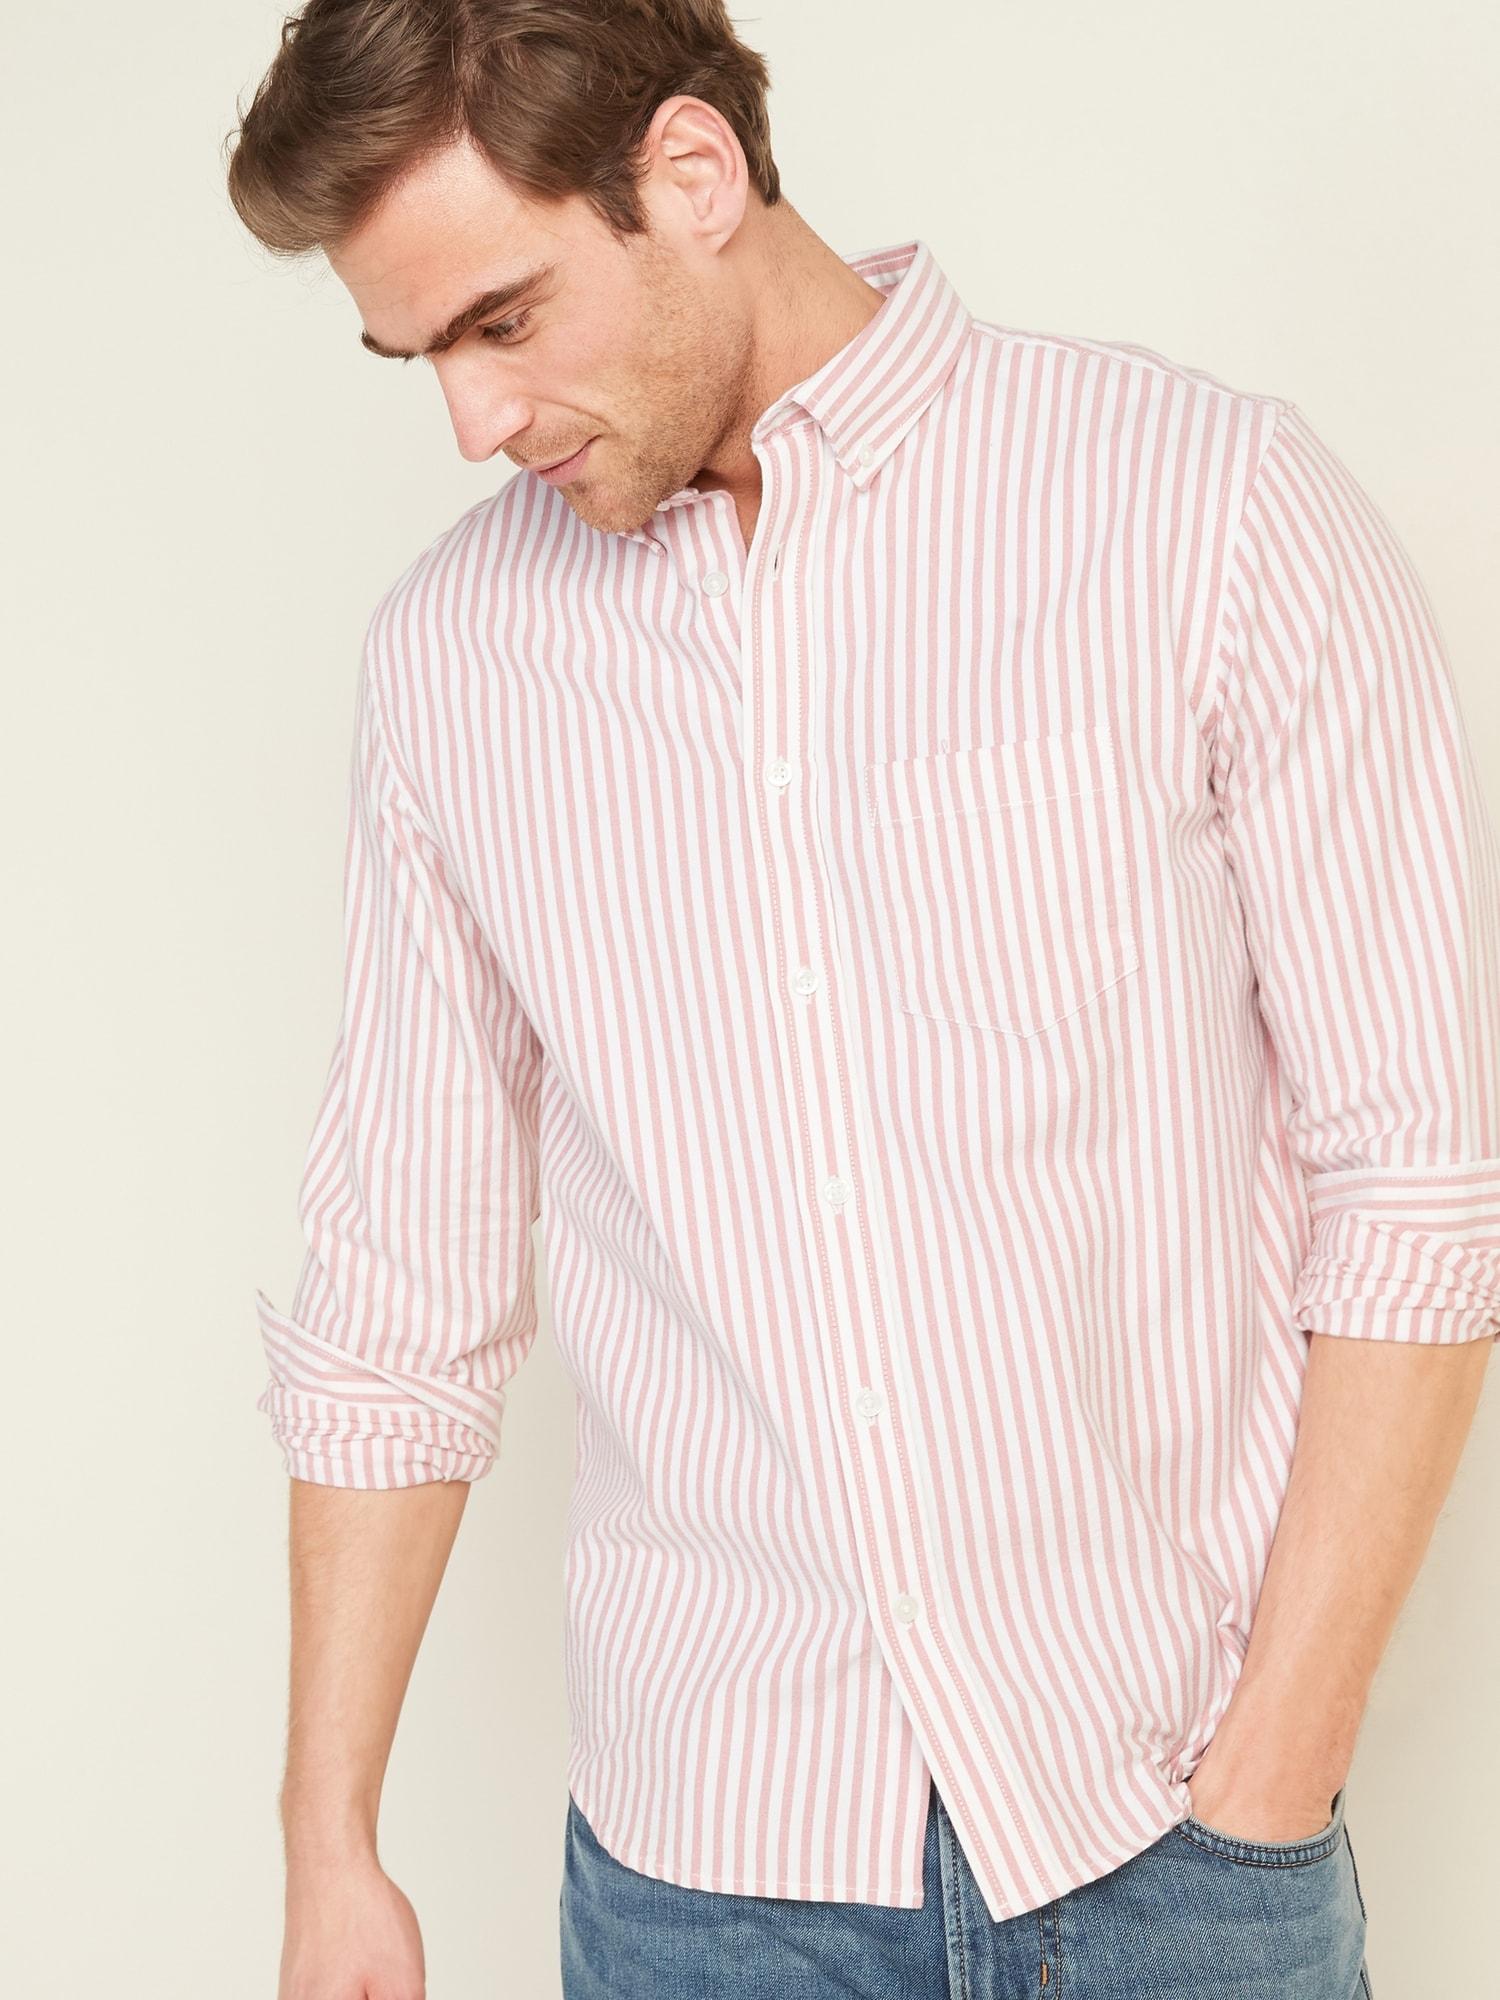 Flex Everyday Oxford Shirt For Men